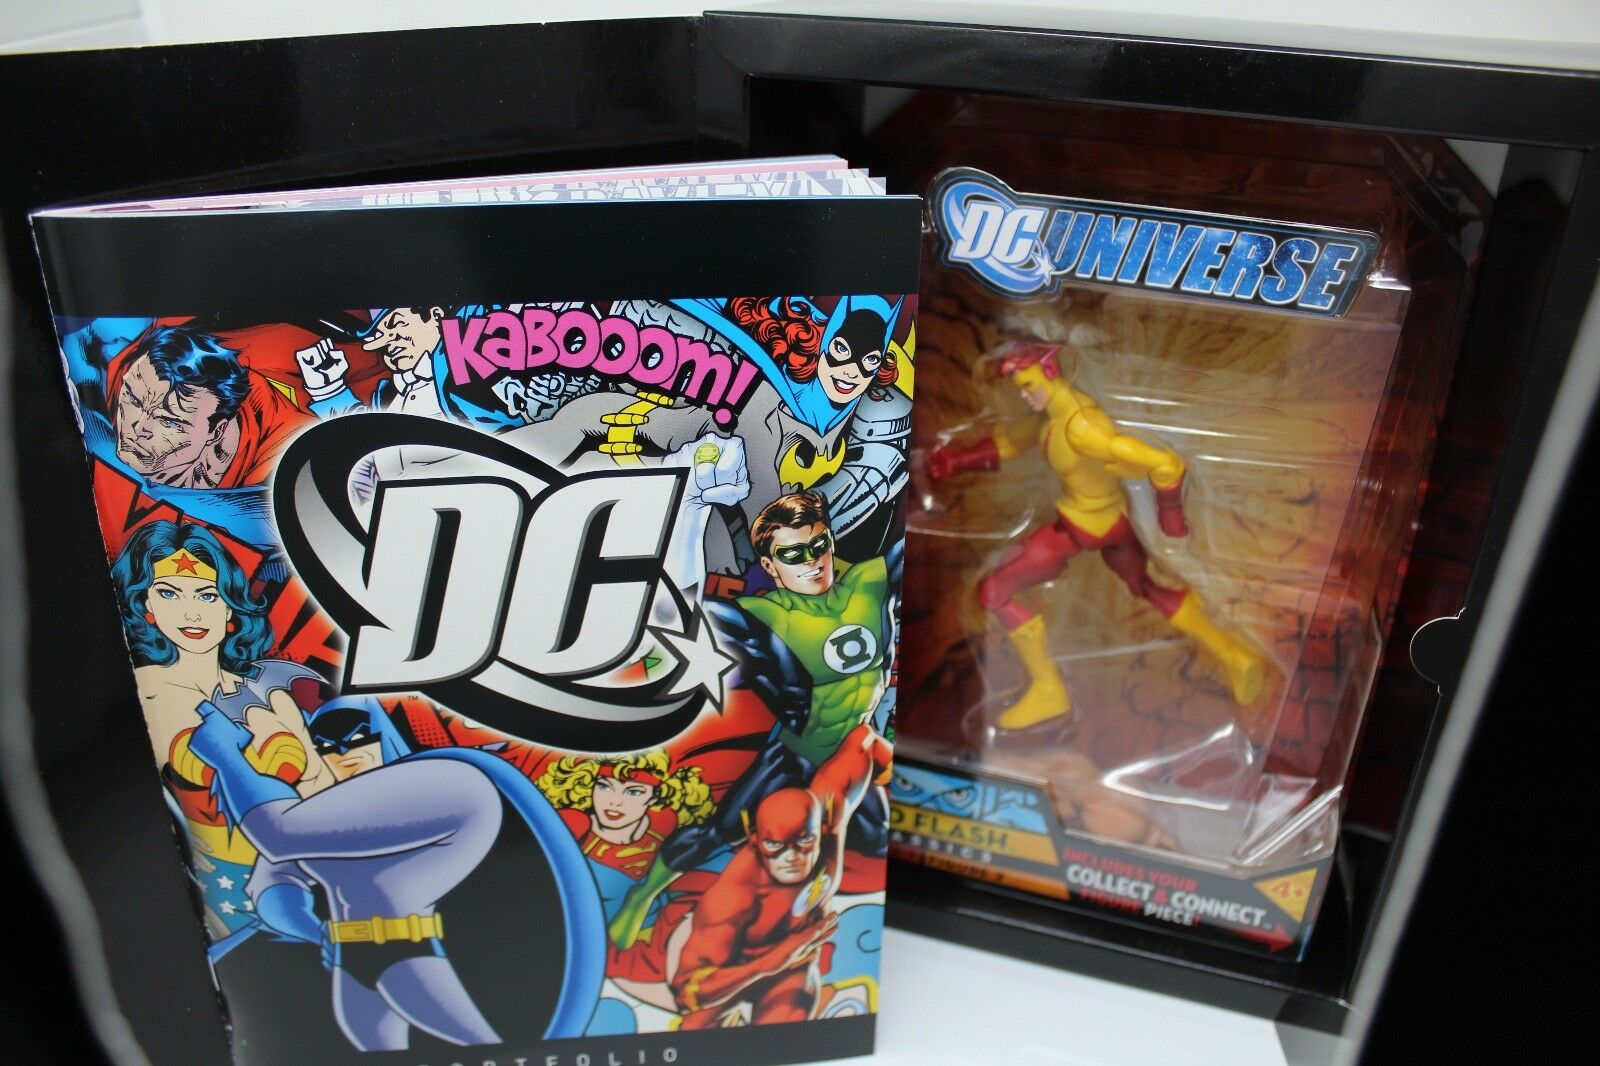 DC Universe Classics DCUC Collect & Connect Kid Flash Figure - Rare Promotional